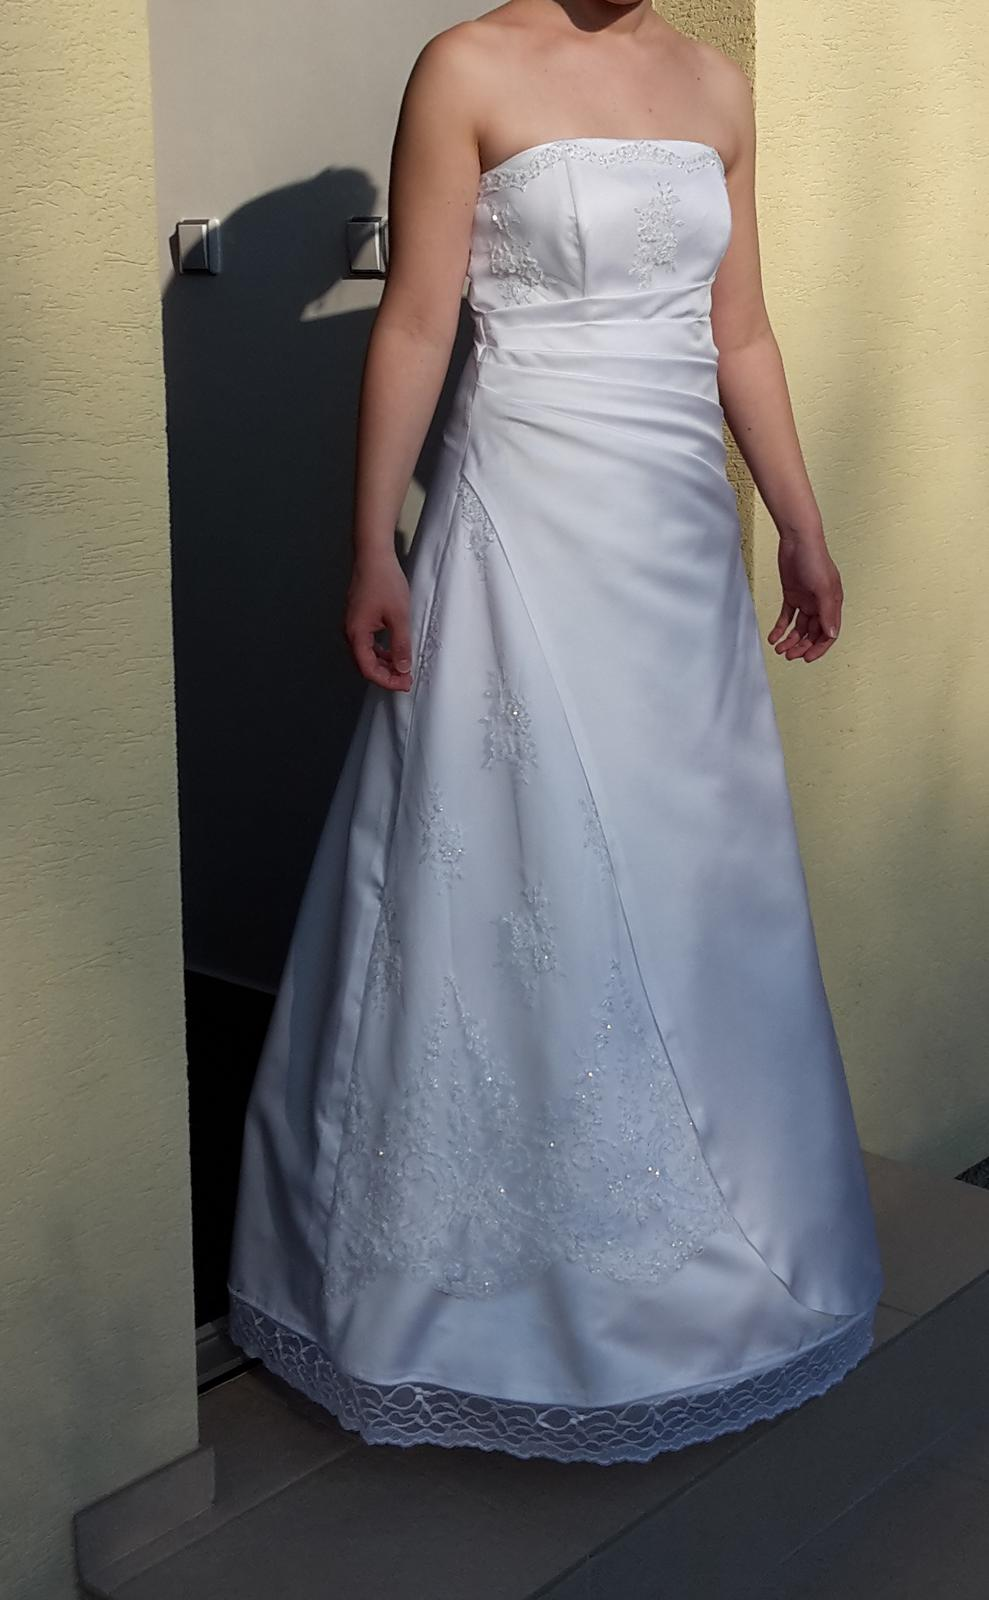 411daf774622 Svadobné šaty 36 38